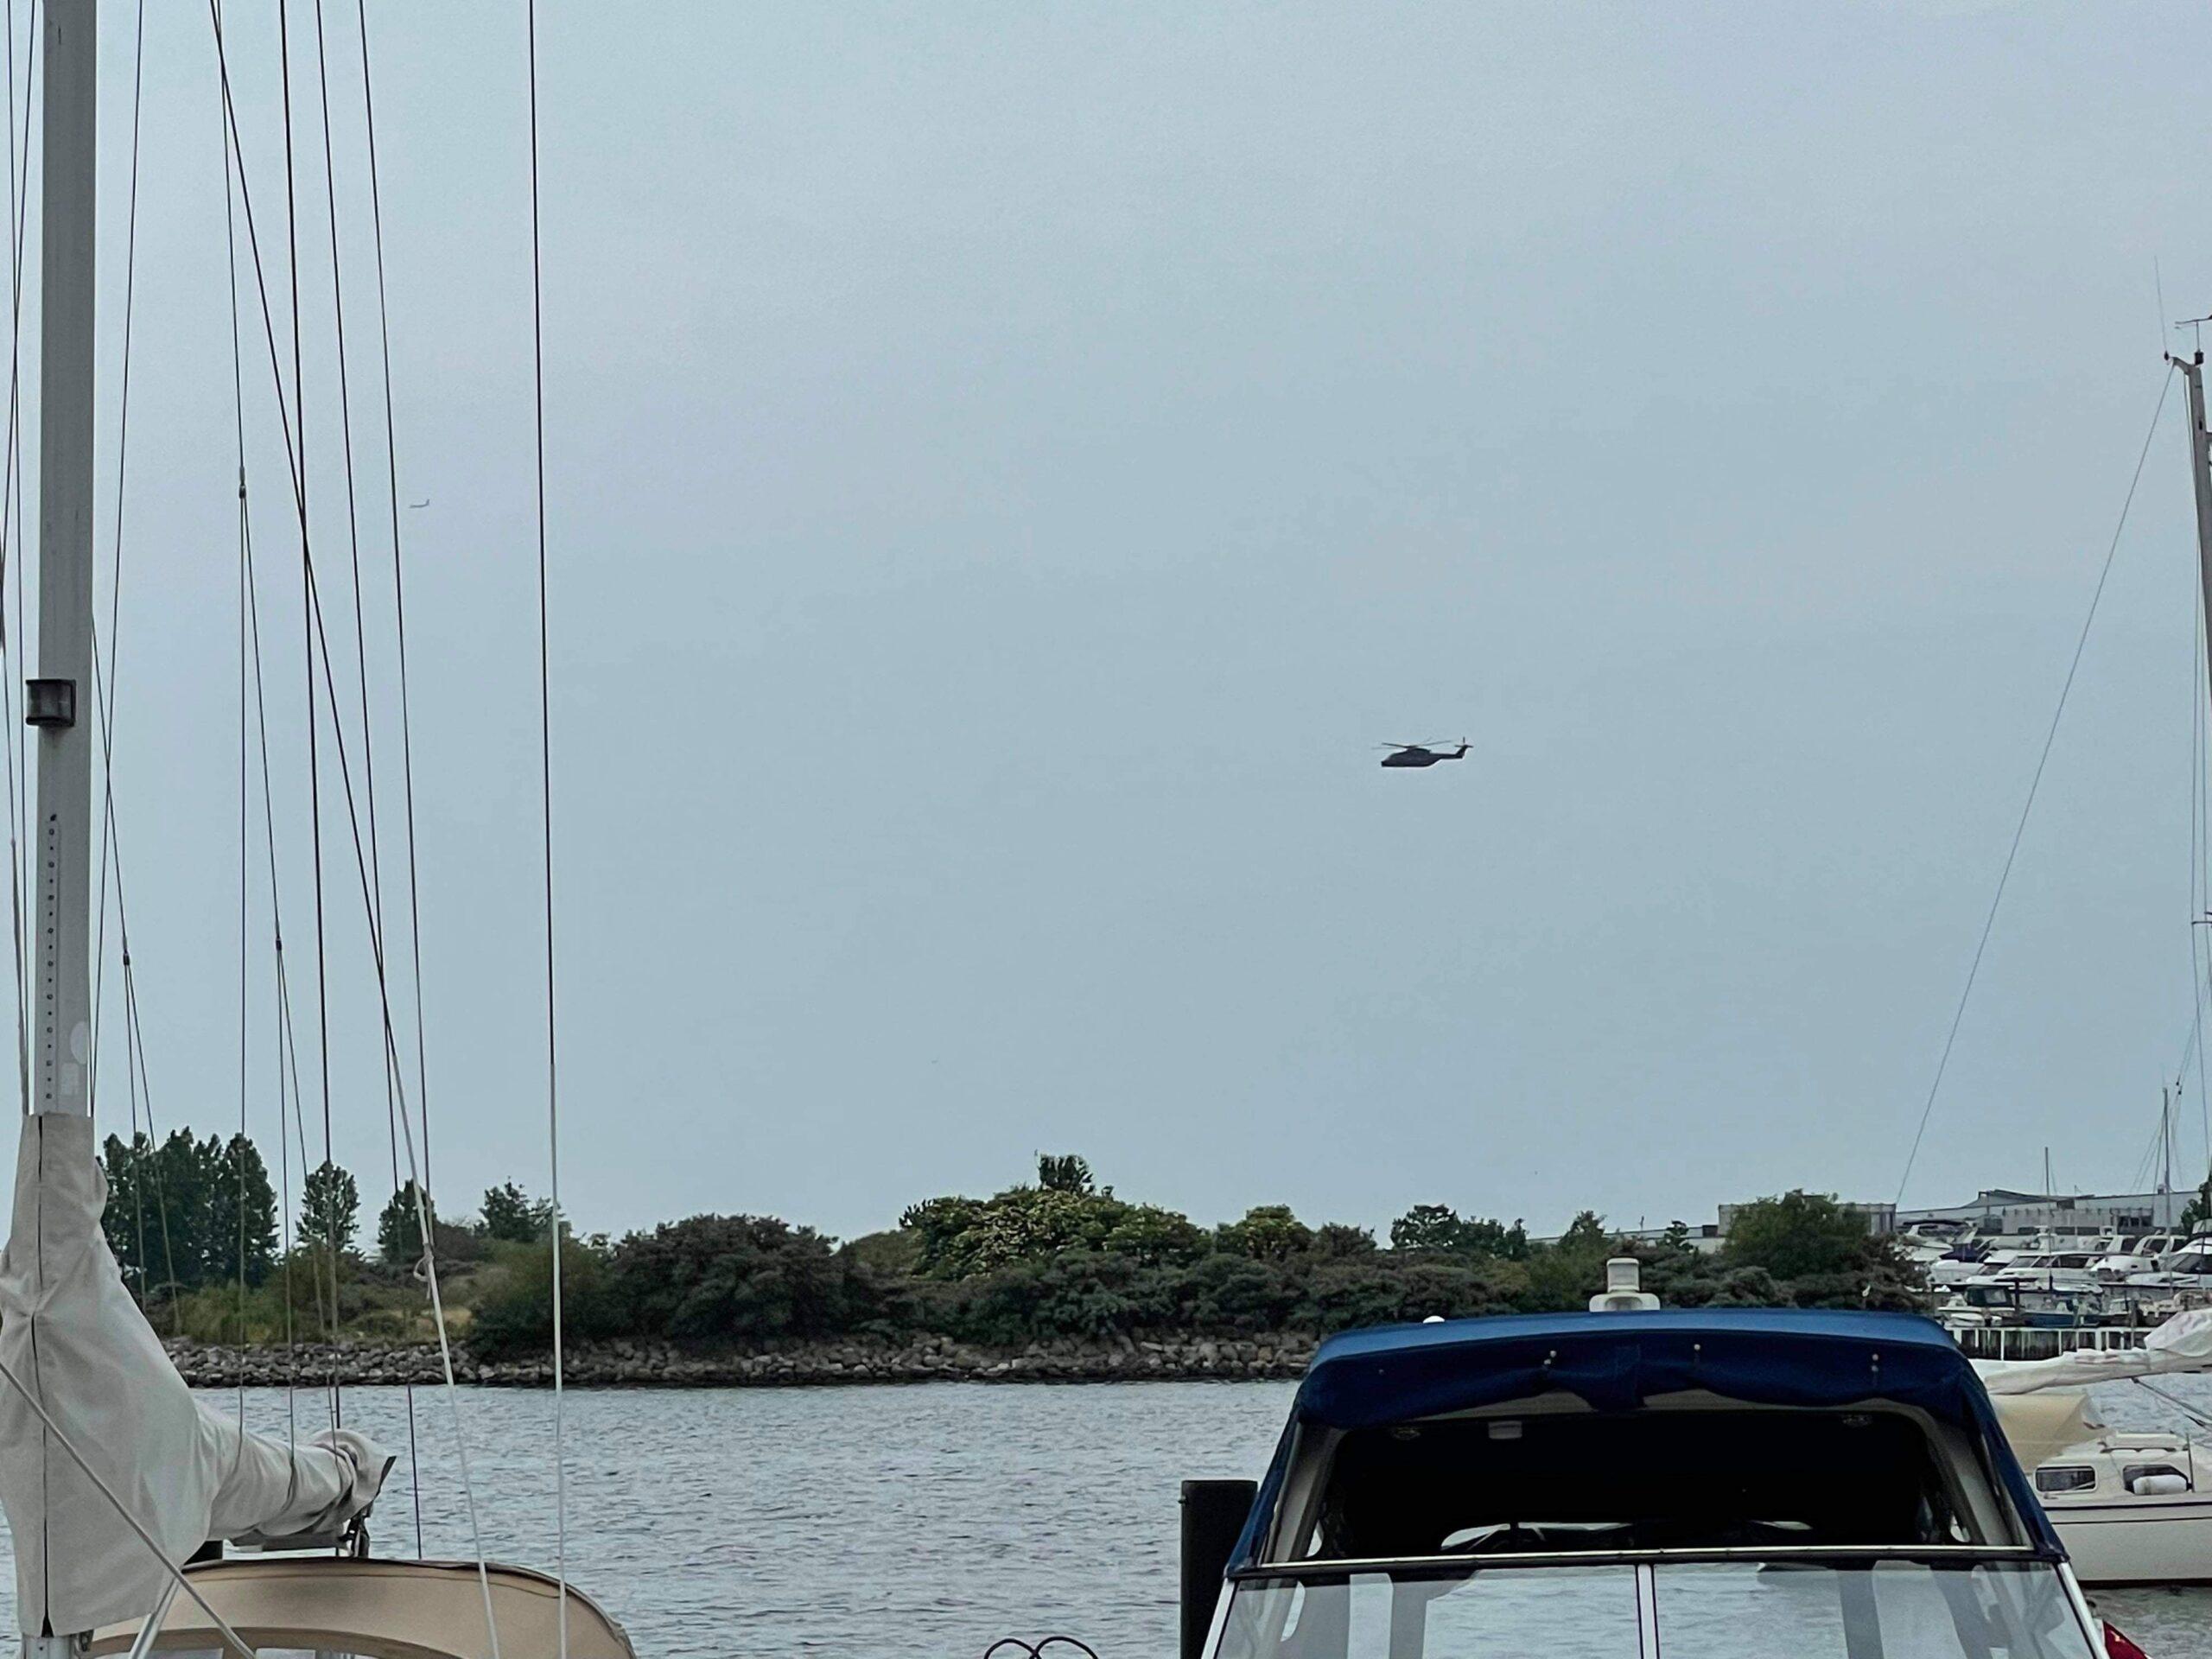 Melding om drukneulykke ved Brøndby strand